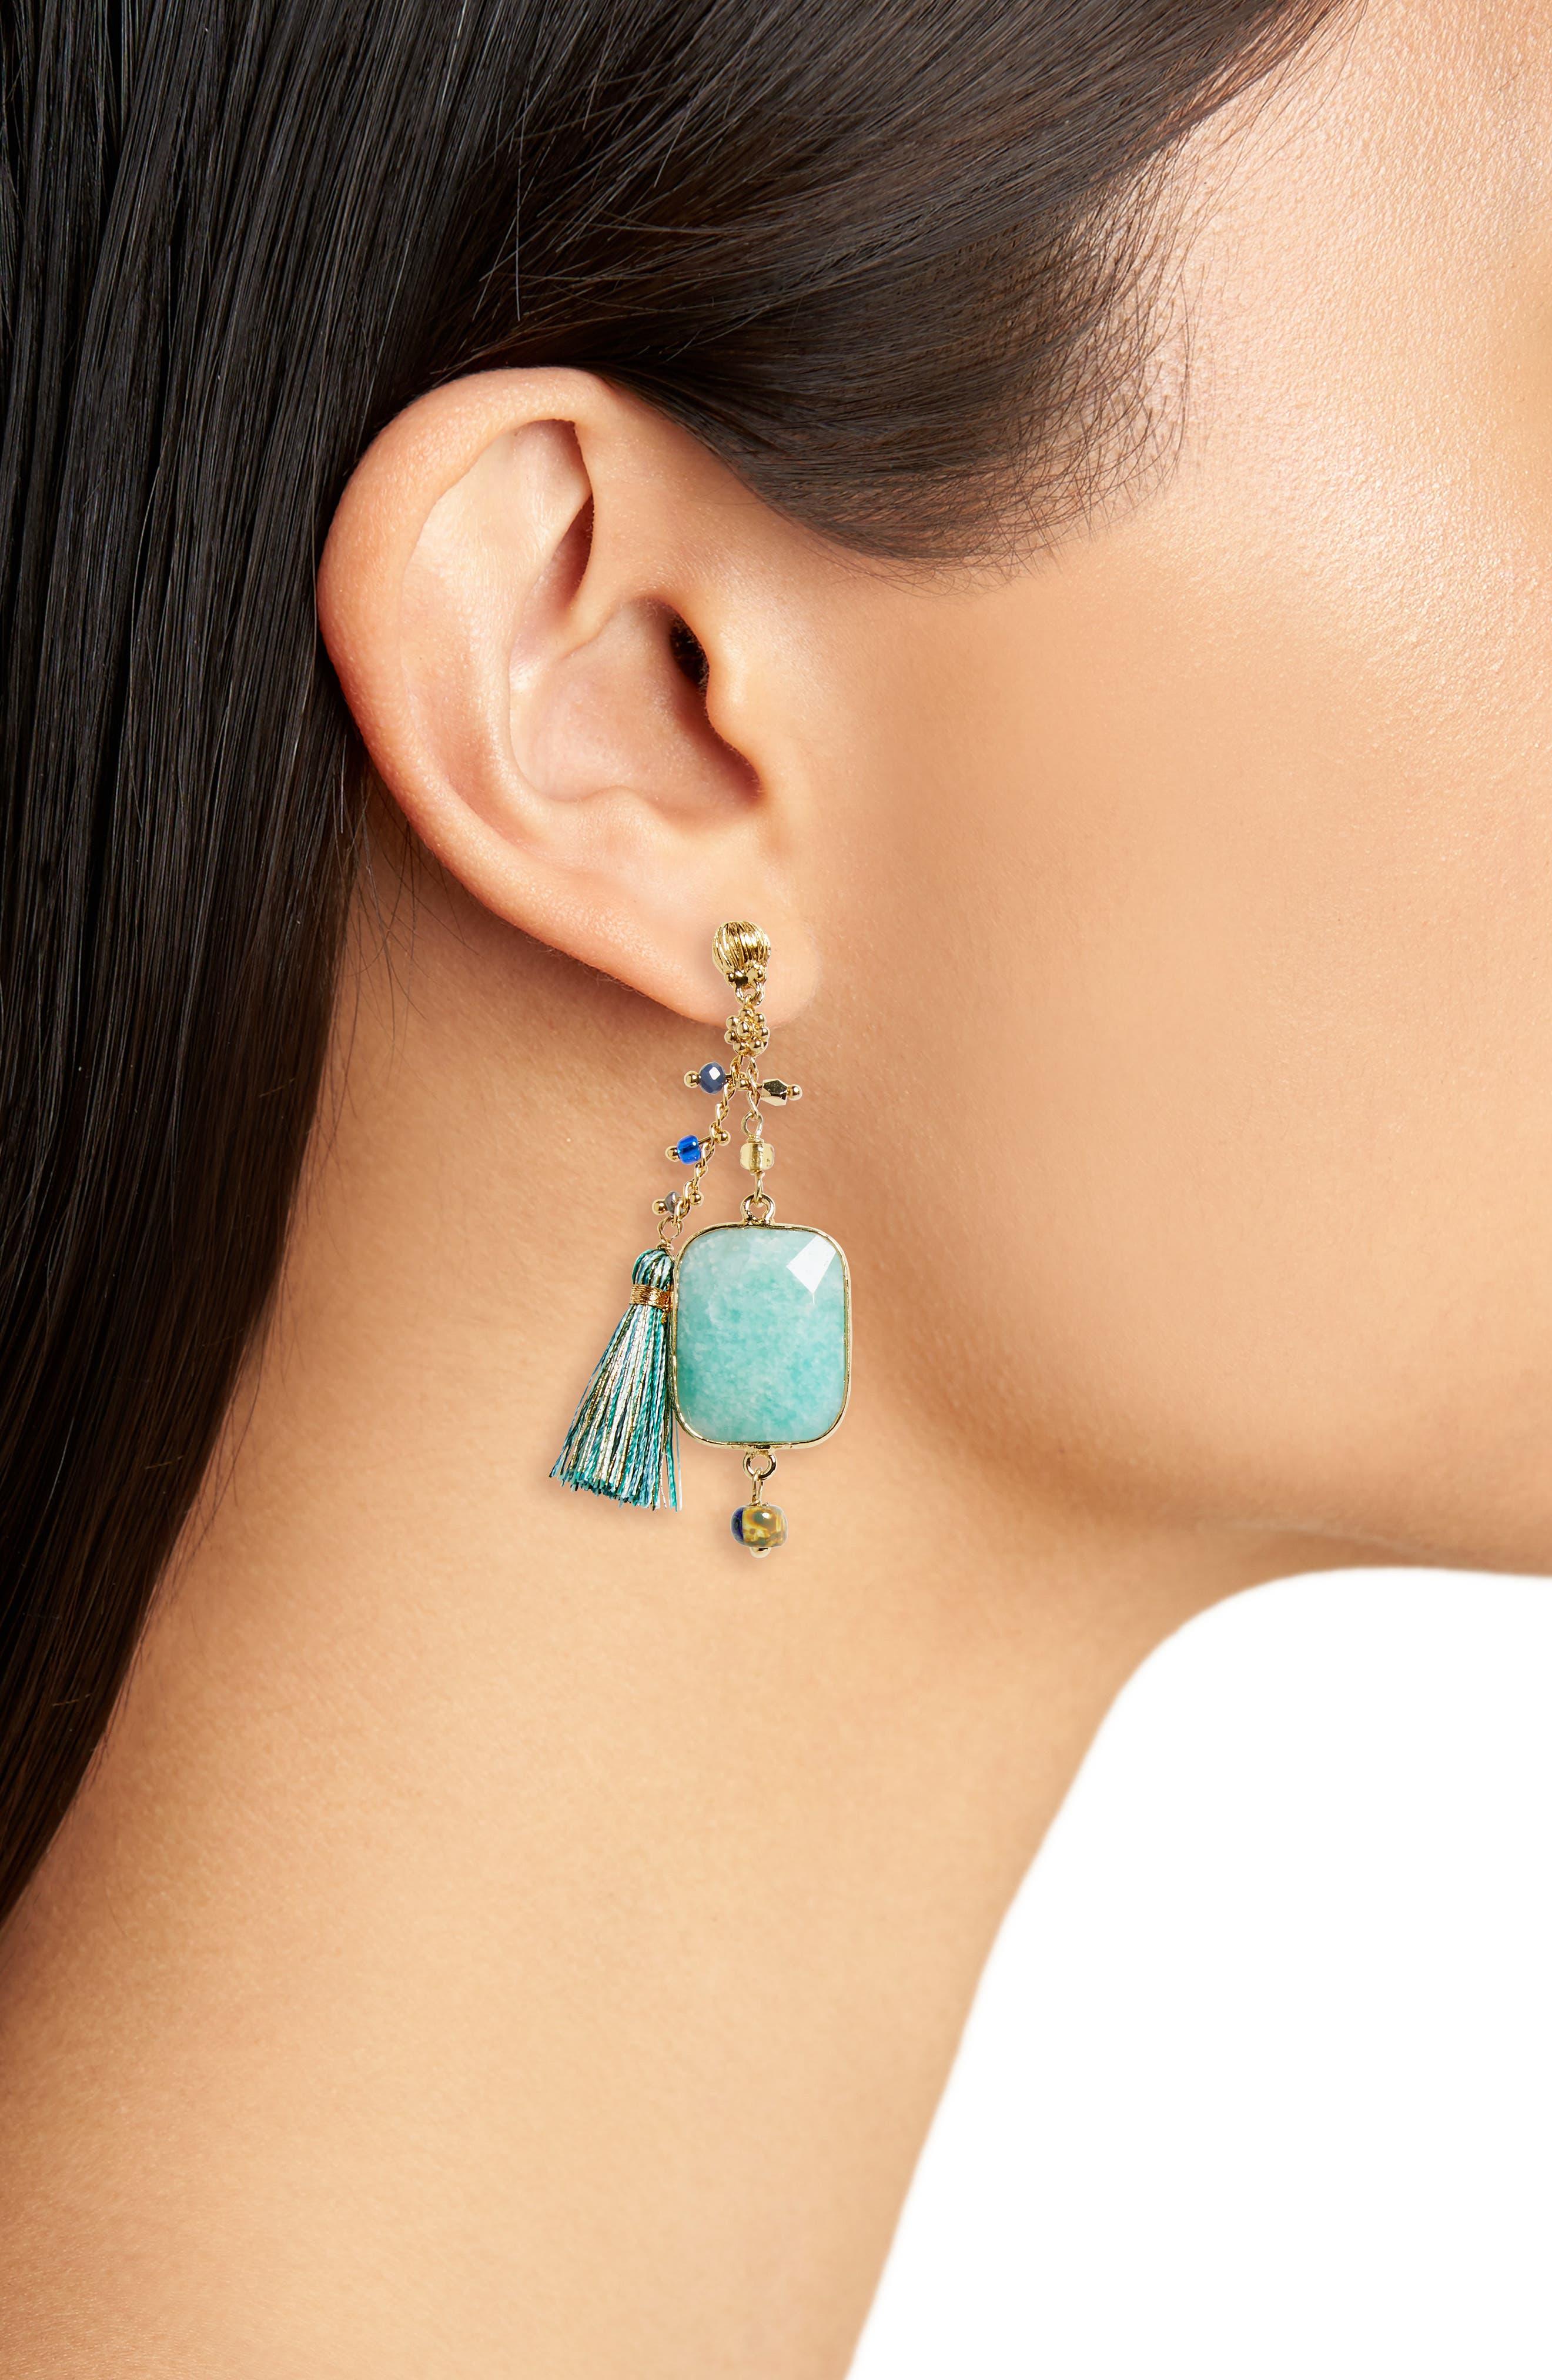 Serti Pondicherie Earrings,                             Alternate thumbnail 3, color,                             AQUA